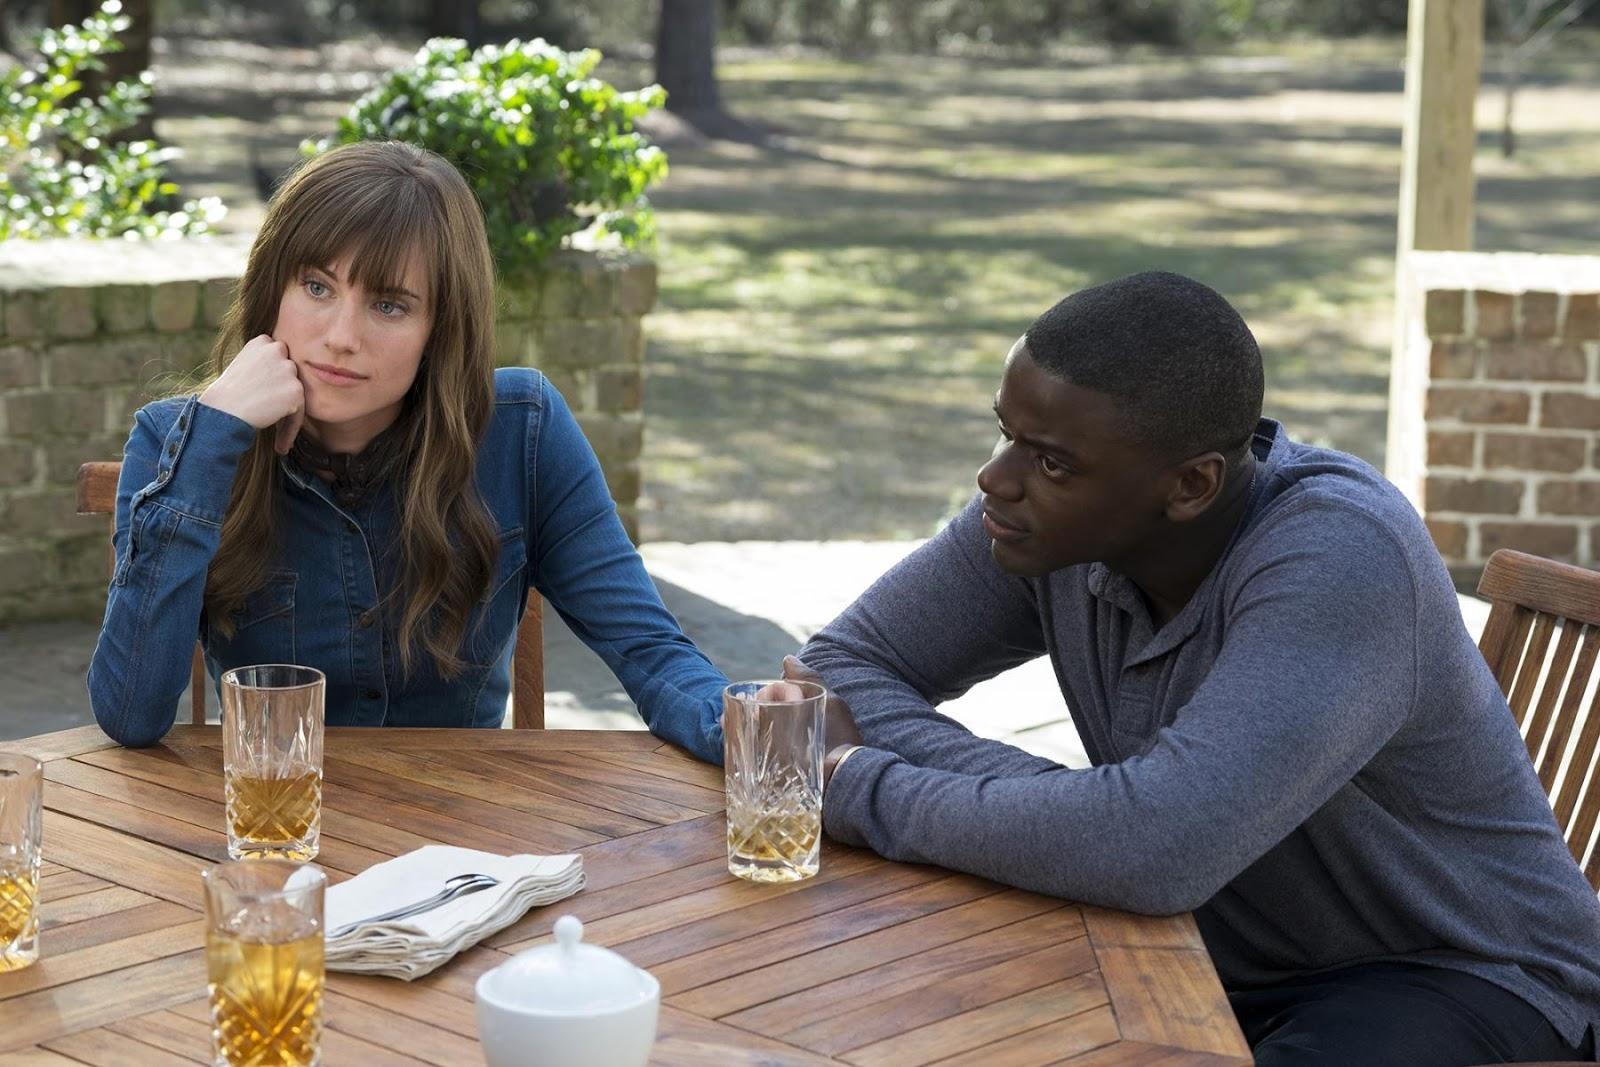 Déjame salir - película  - Daniel Kaluuya y Allison Williams